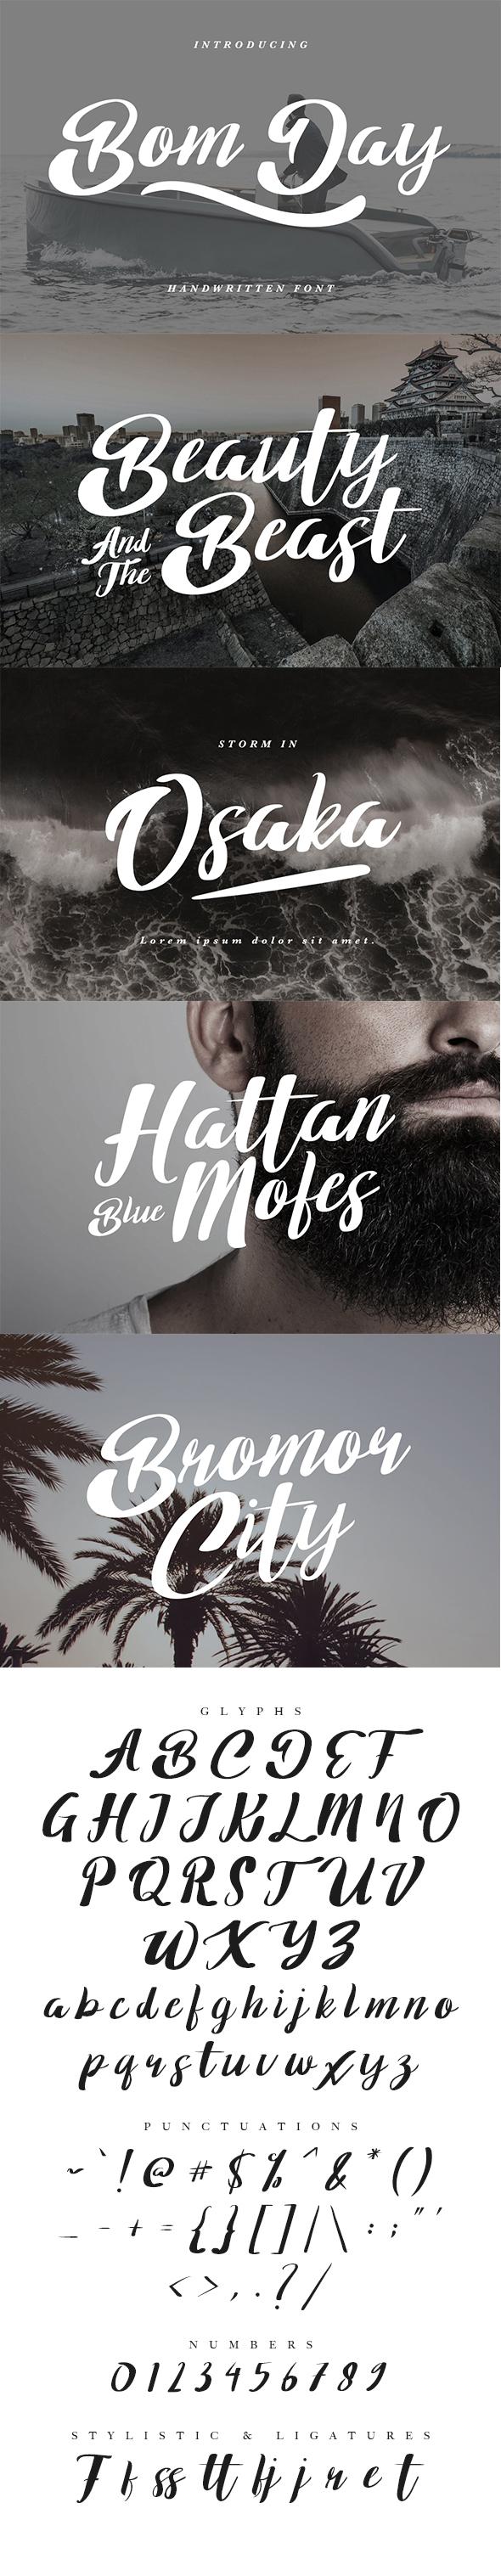 Bom Day Font - Calligraphy Script